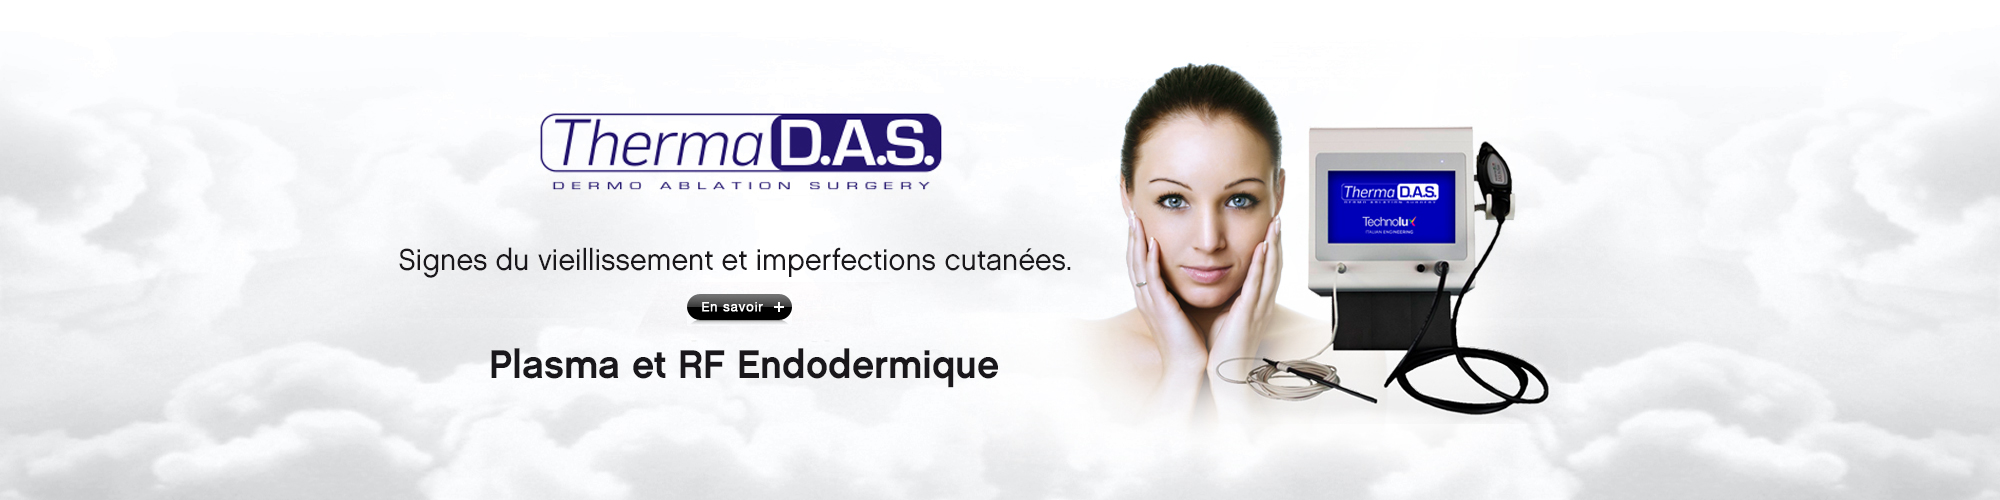 https://www.capactuel.com/storage/app/media/Accueil/THERMADAS2.jpg